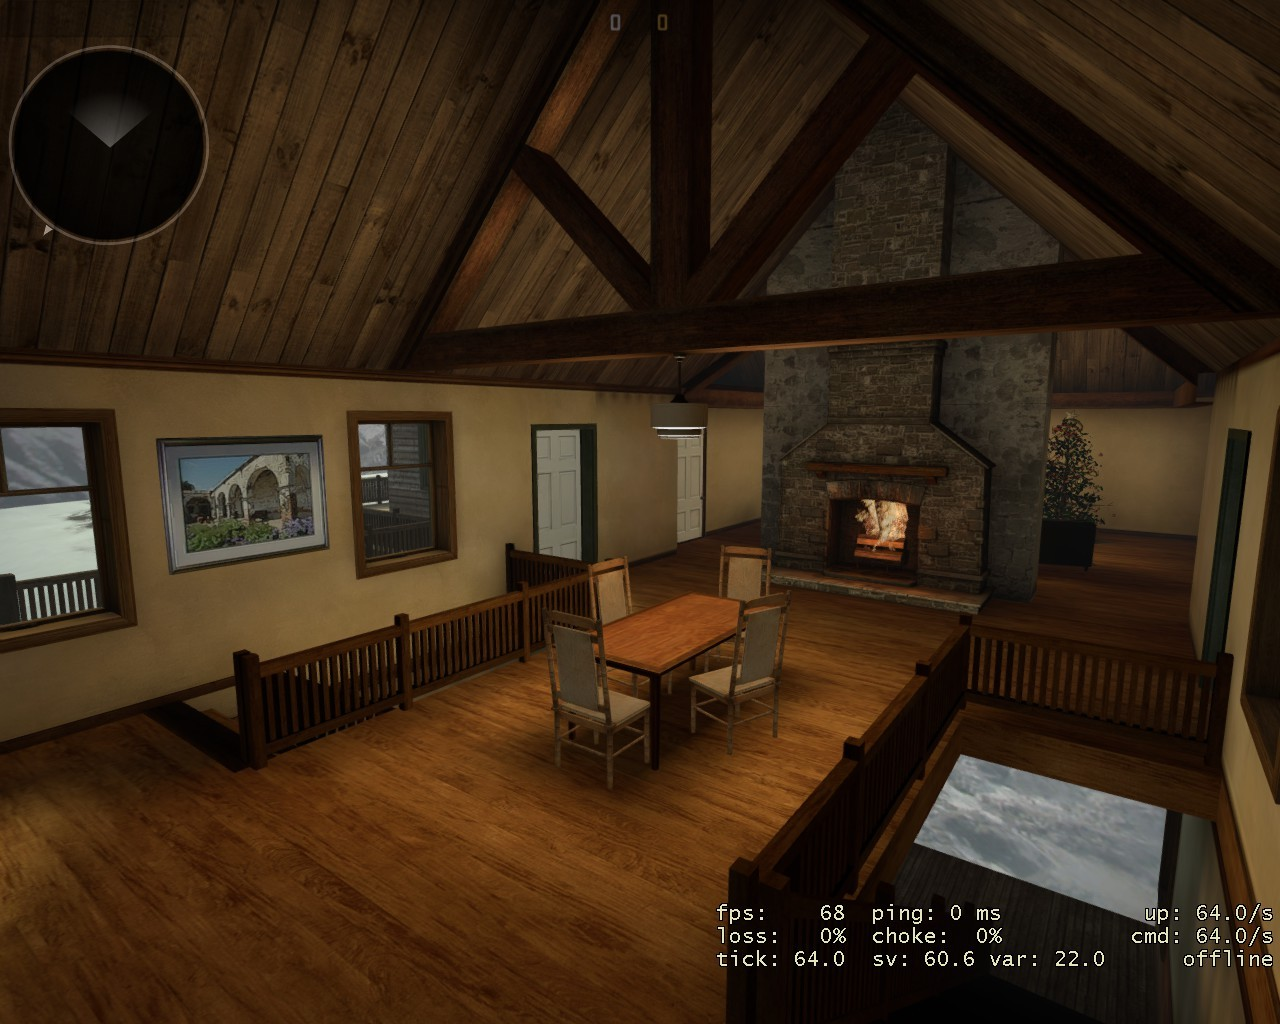 Ar_Winter_Lodge WiP screenshot #2